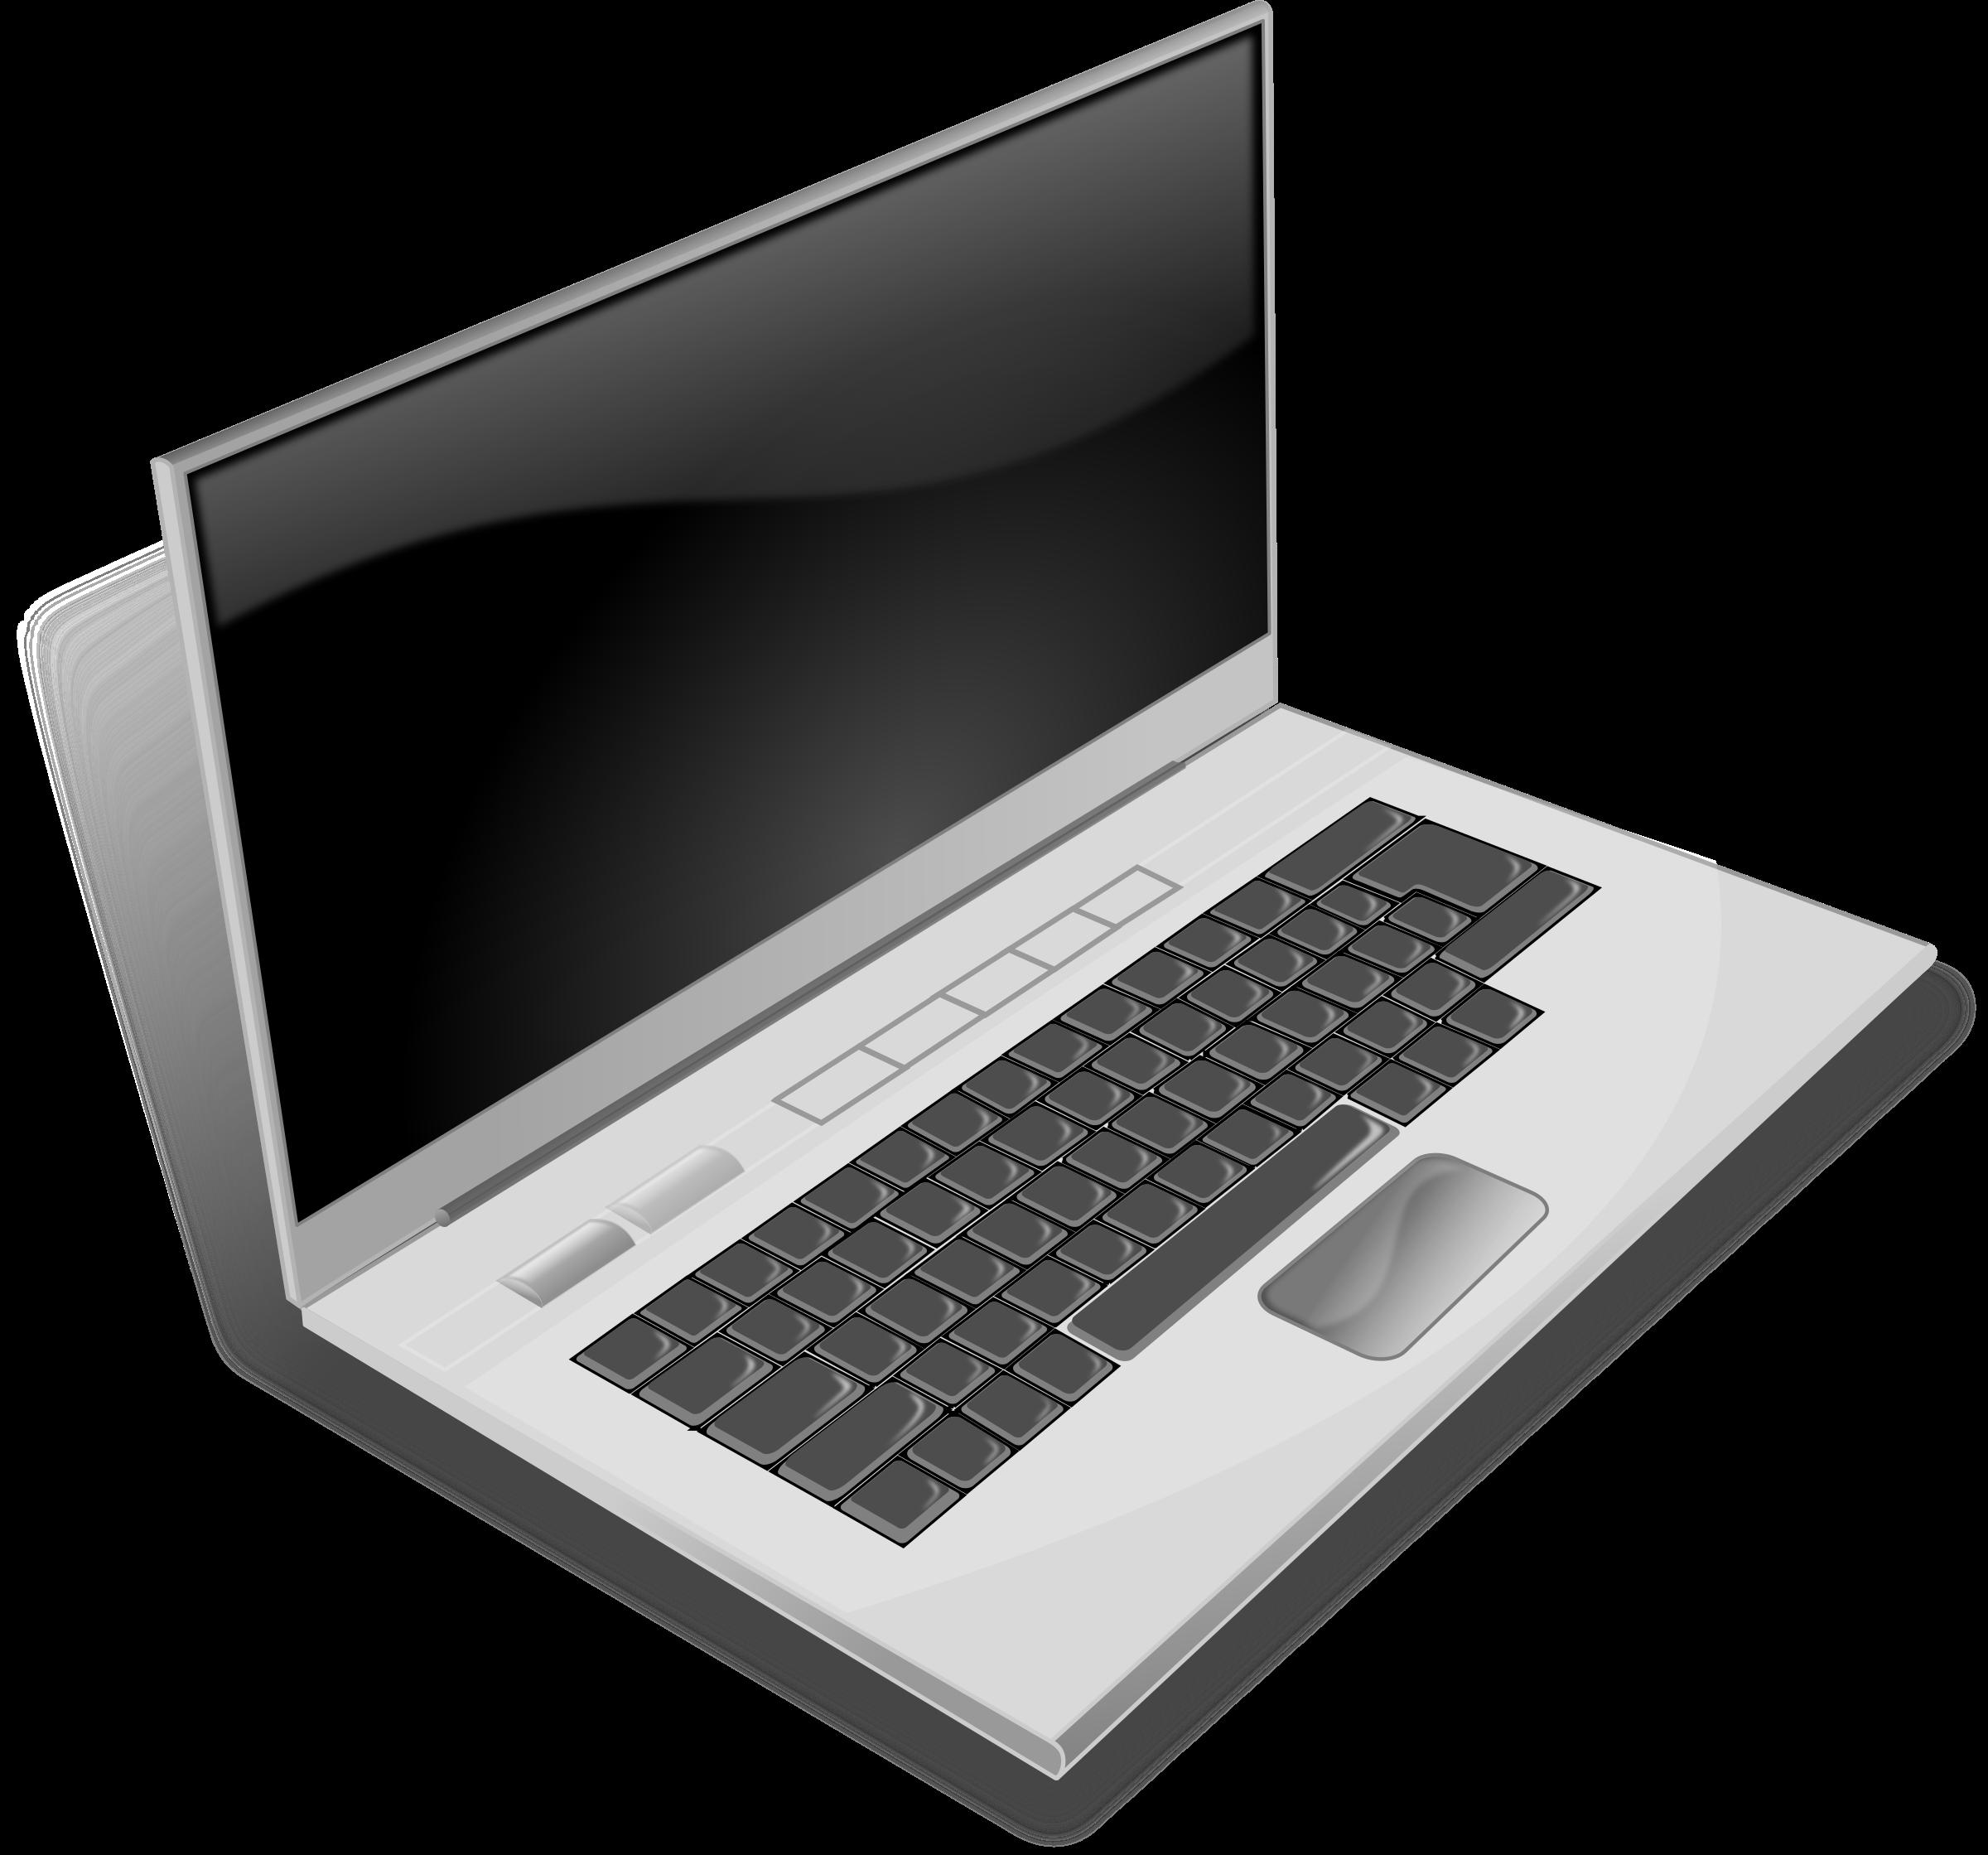 Notebook clipart small notebook. A gray laptop big